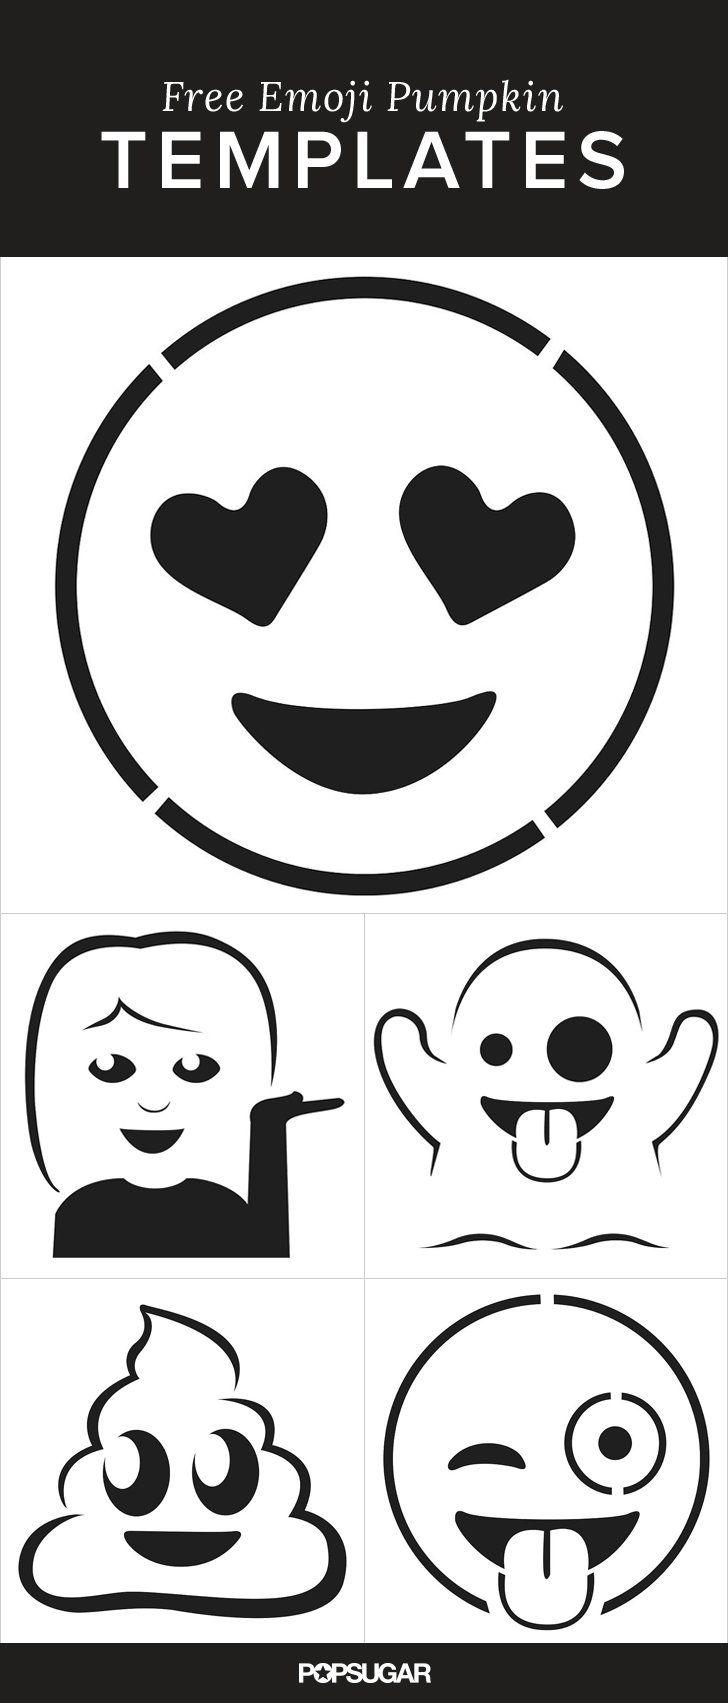 Hundred Points   Pinterest   Pumpkin template, Emoji and Template